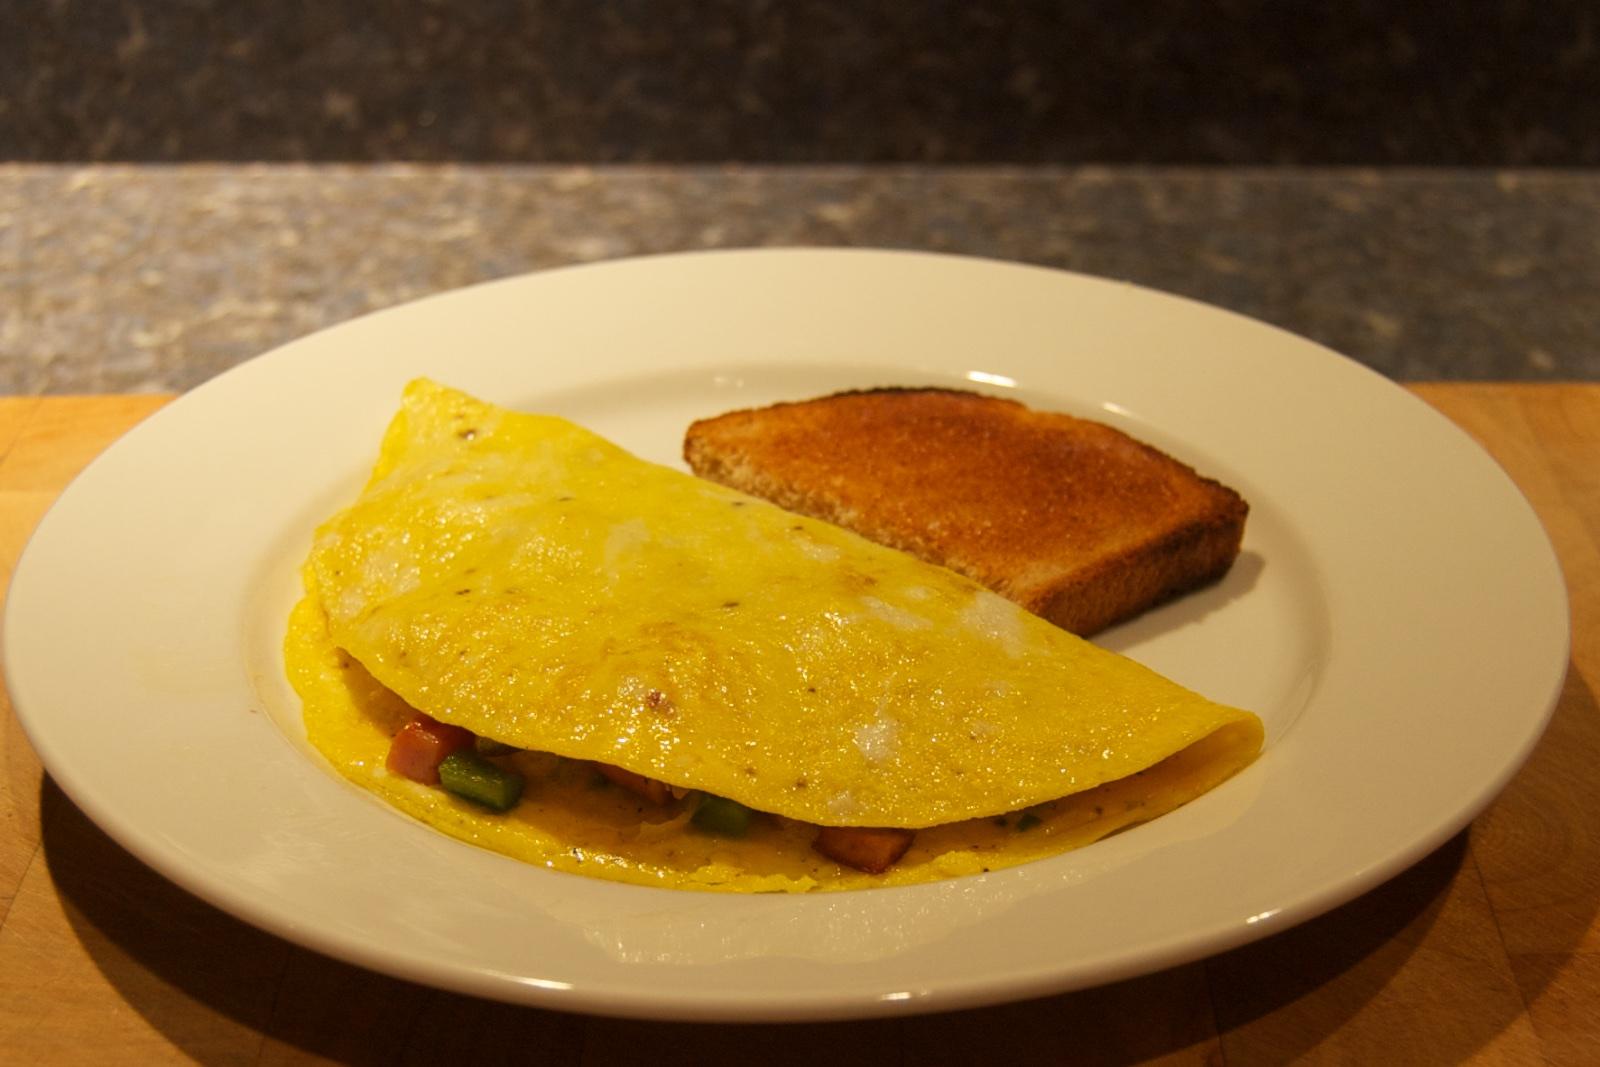 http://blog.rickk.com/food/2015/03/16/ate.2015.03.16.b.jpg